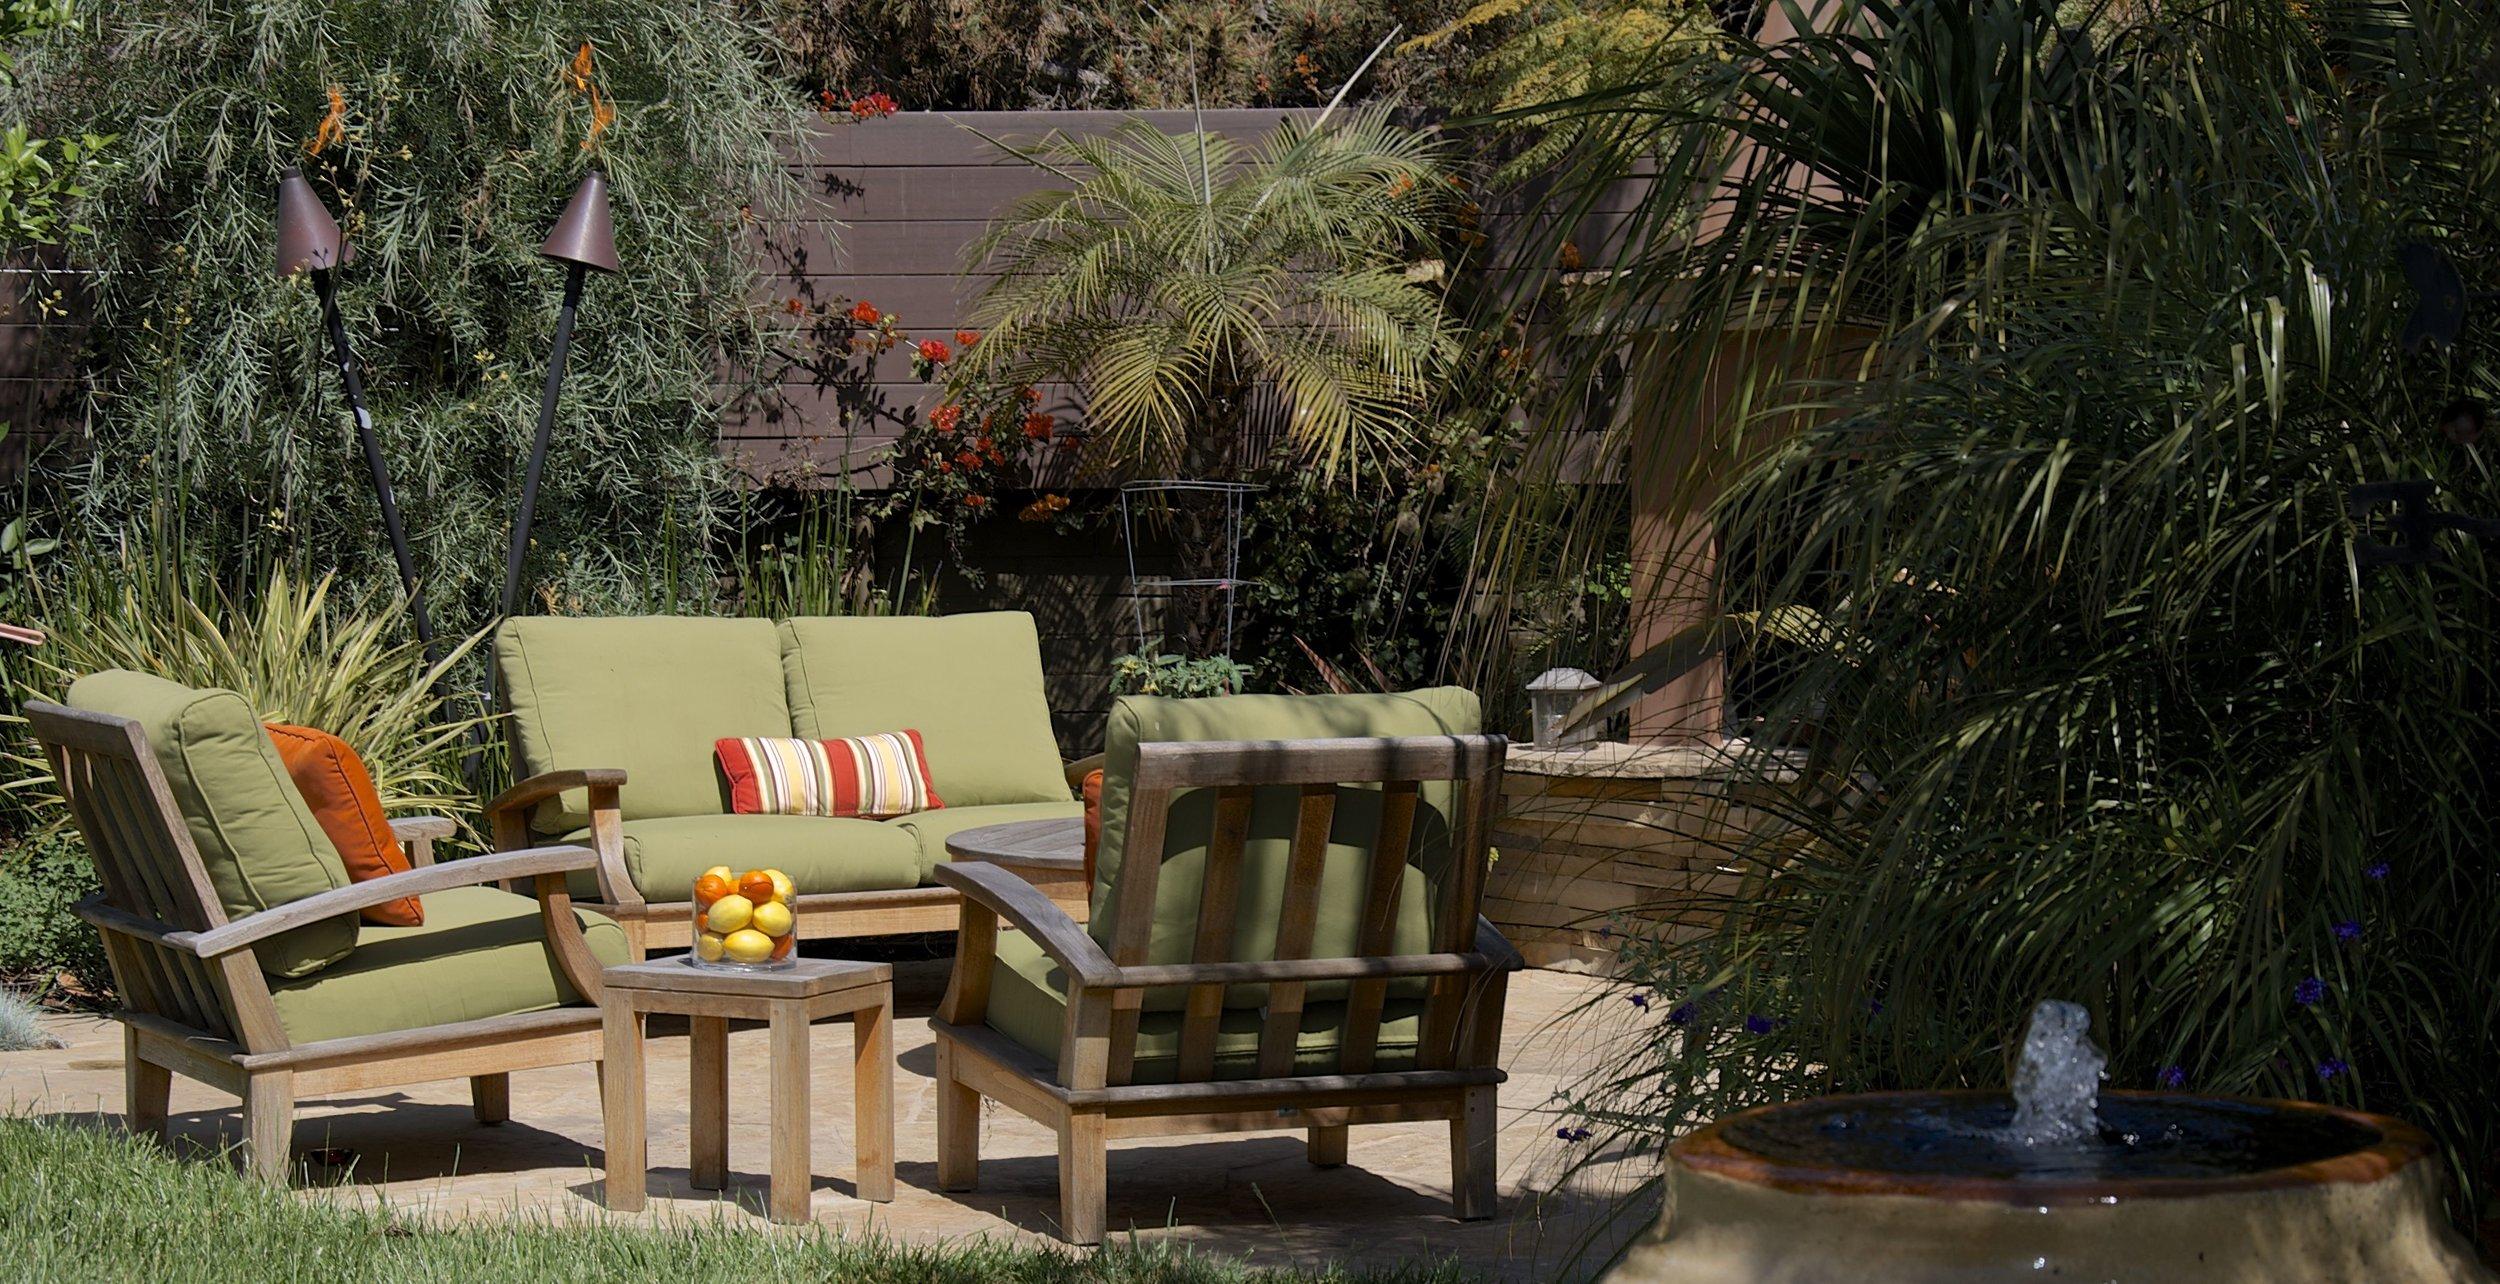 Tropical Garden - WestchesterOutdoor fireplaceWater featuresBBQPergola & dining area